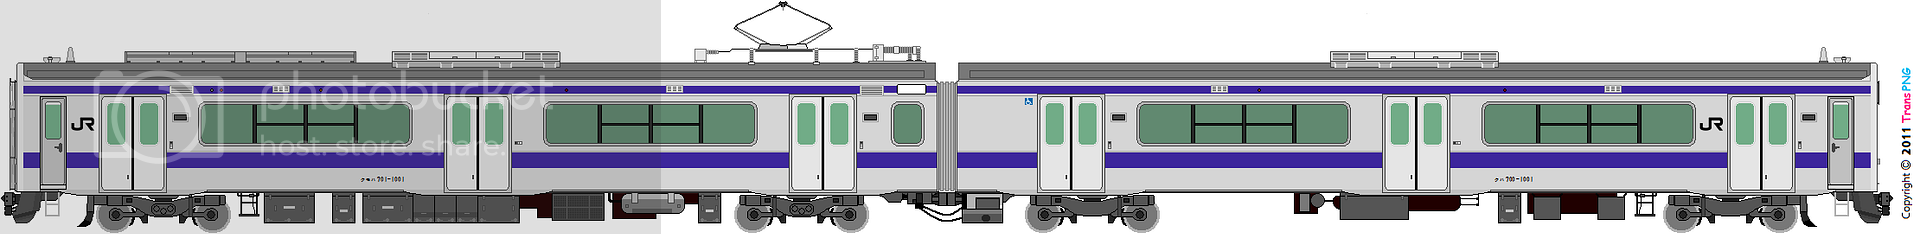 Train 2260